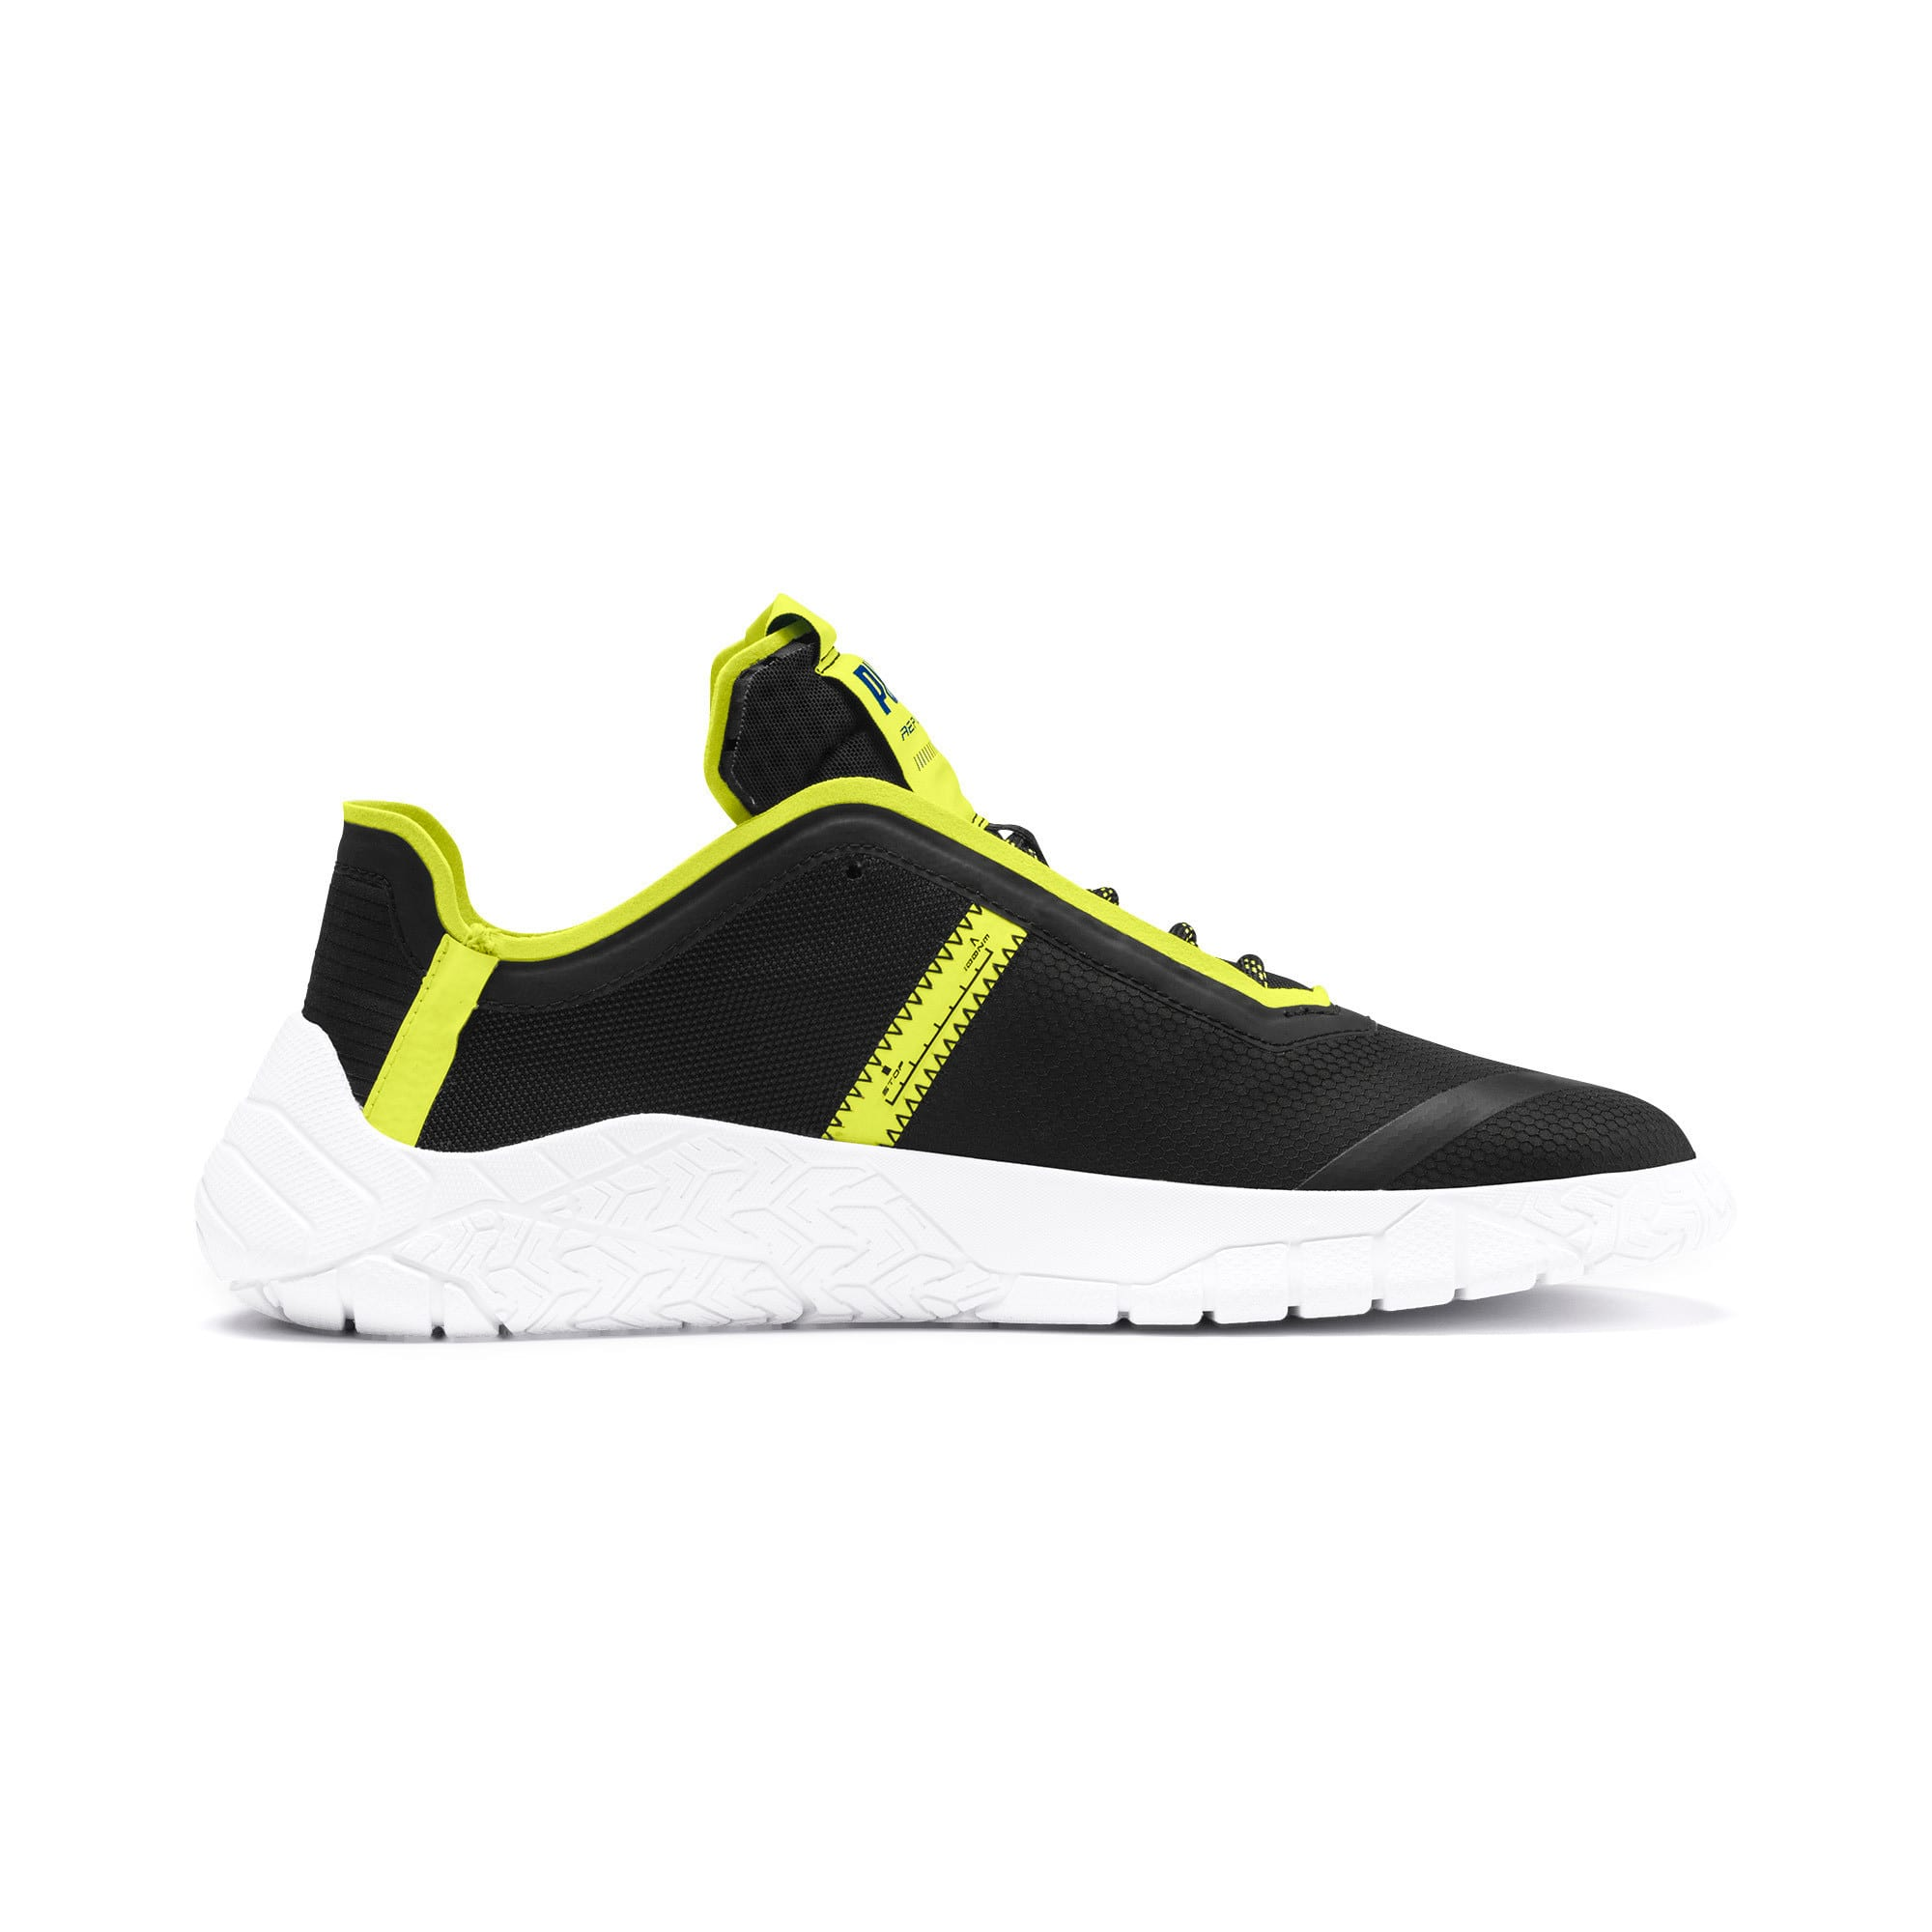 Thumbnail 5 of Replicat-X Circuit Motorsport Shoes, Black-Fizzy Yellow-White, medium